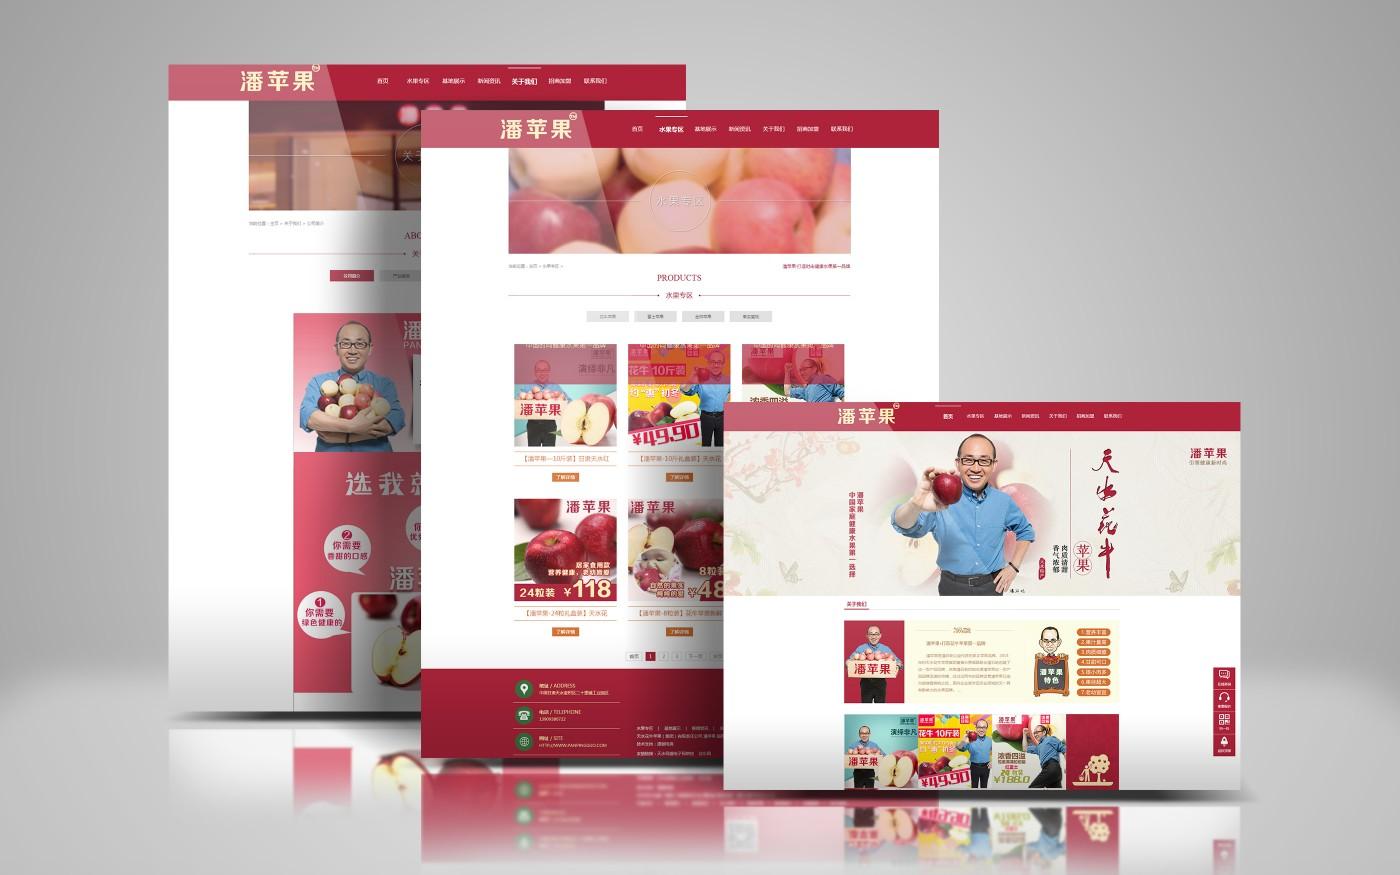 潘苹果<a href='http://www.6chuangyi.com/' title='' style='color:;font-weight:bold'>品牌策划</a>13.jpg